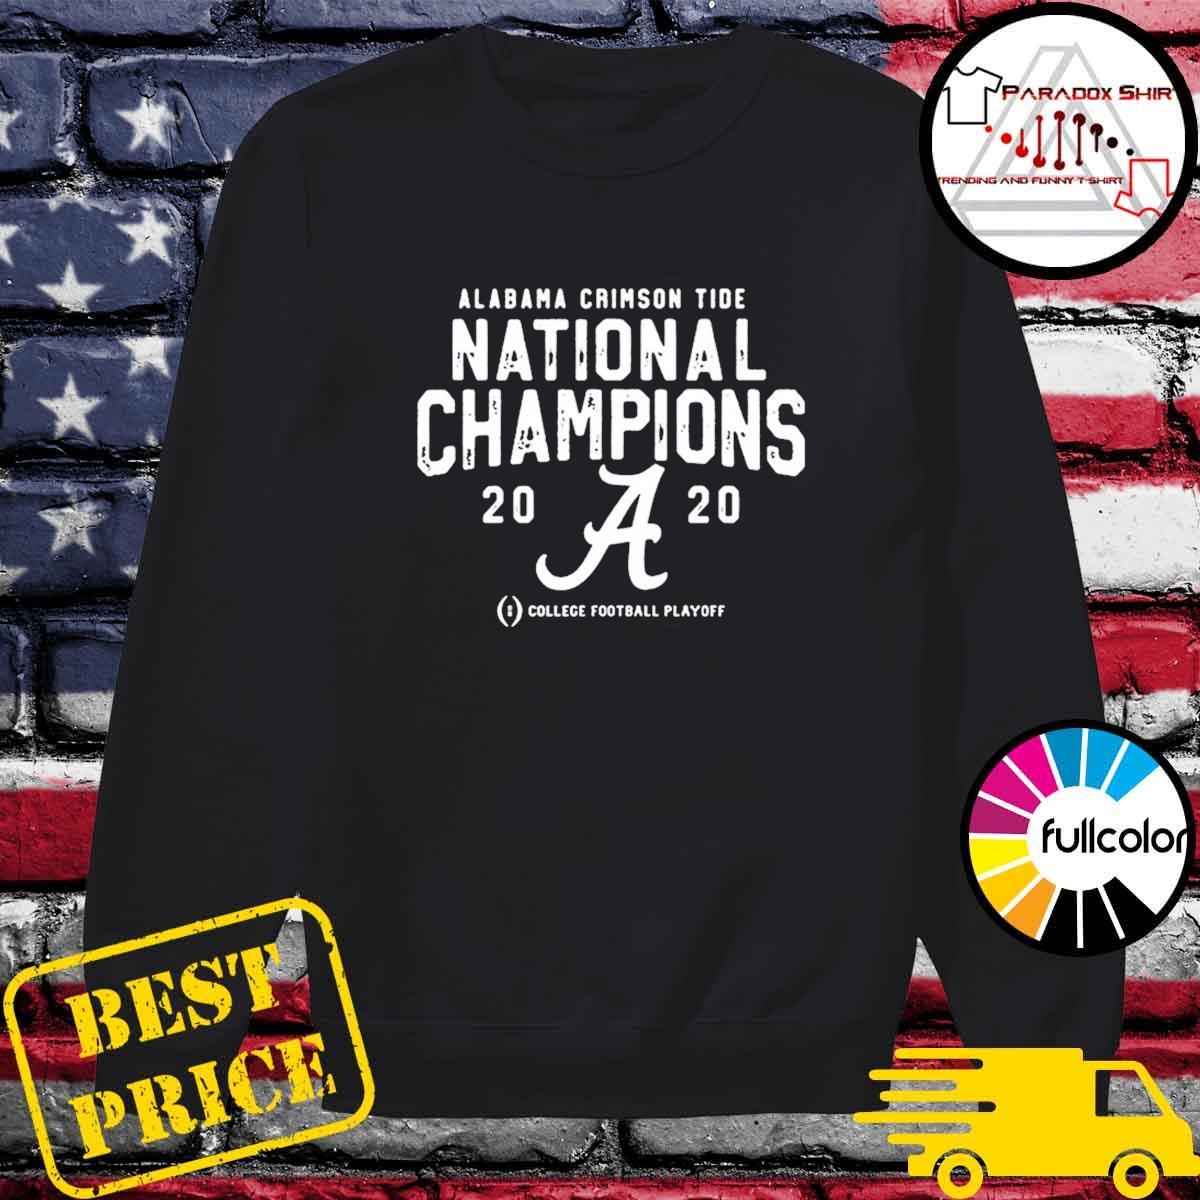 Alabama Crimson Tide College Football Playoff 2021 National Championship T-Shirt Sweater